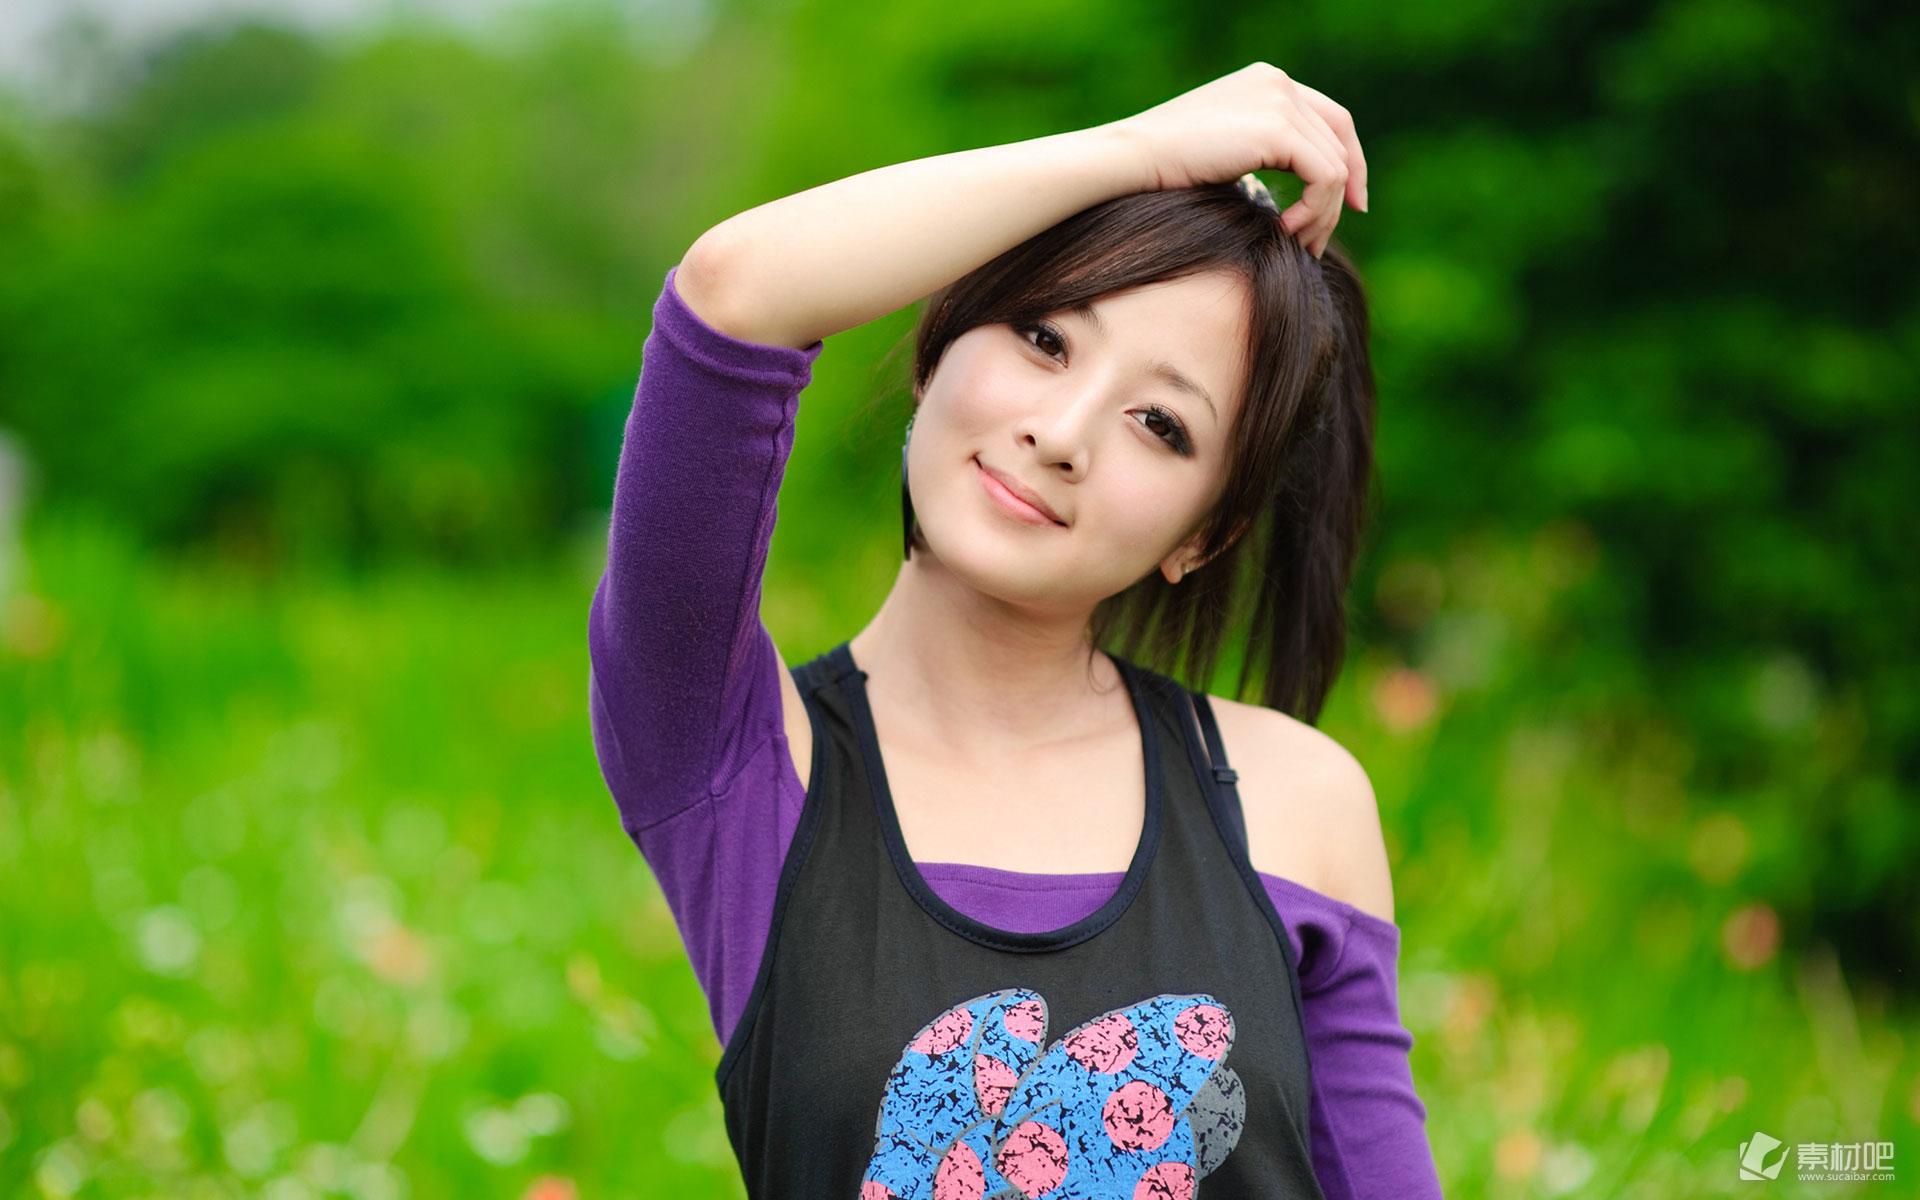 taiwan beaufiful girl mikako - photo #15